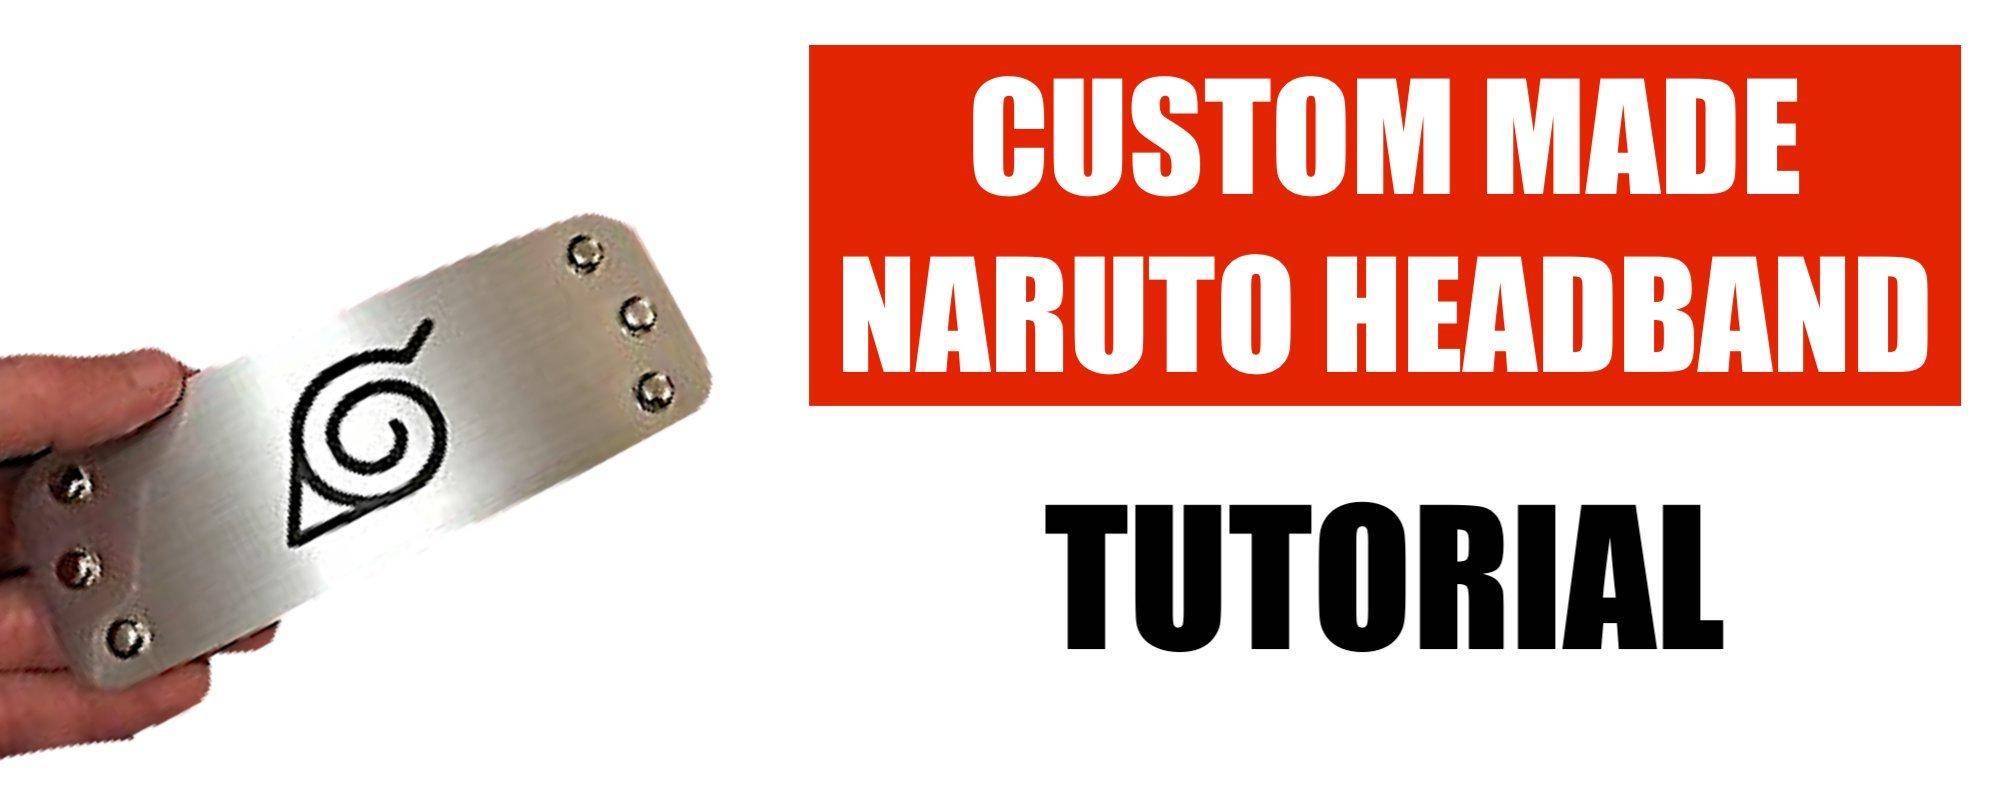 How to make a Naruto headband